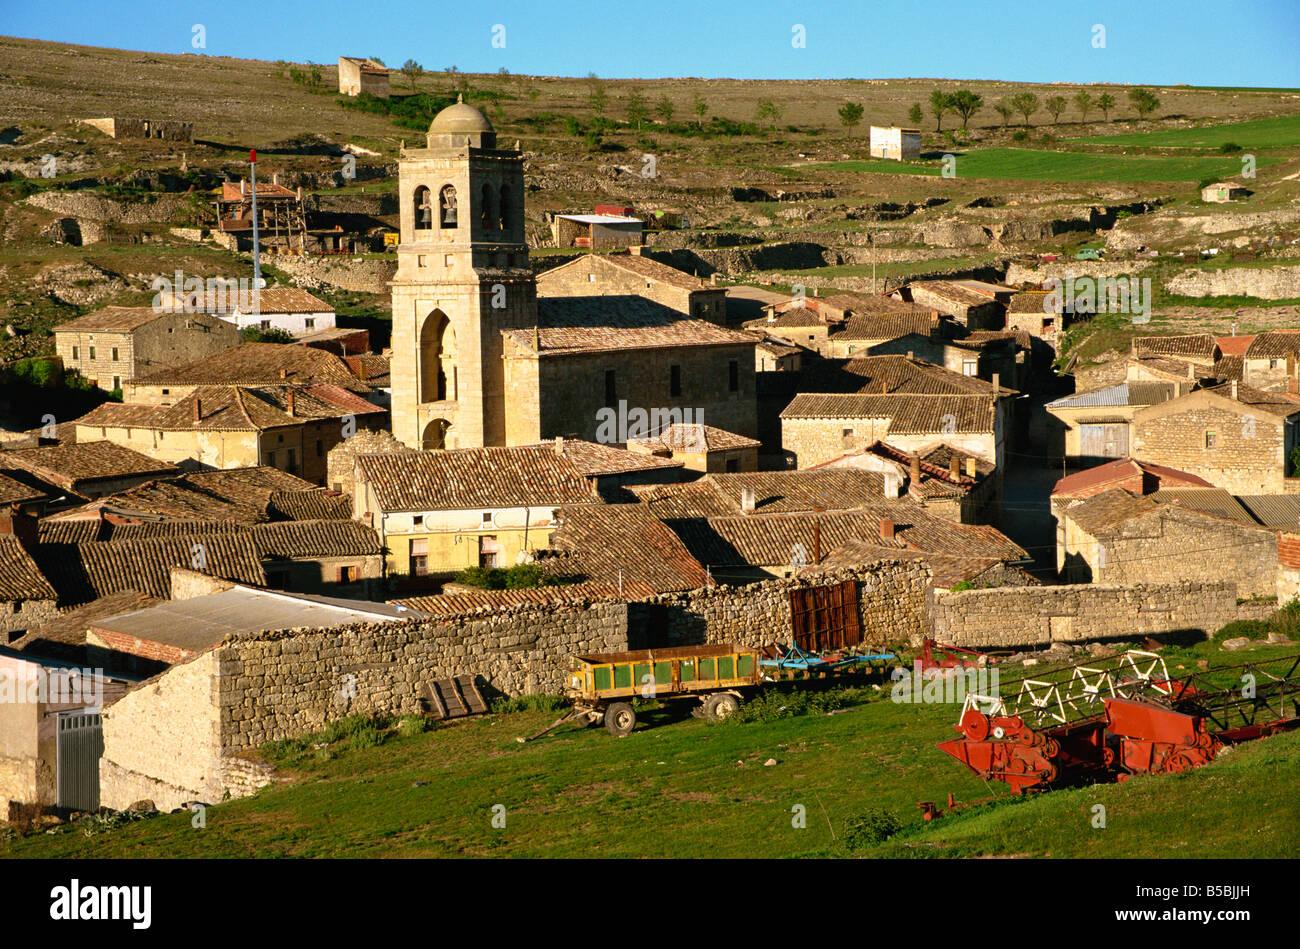 Traditional farming village Hontanas Burgos Castilla y Leon Old Castile Spain Europe - Stock Image